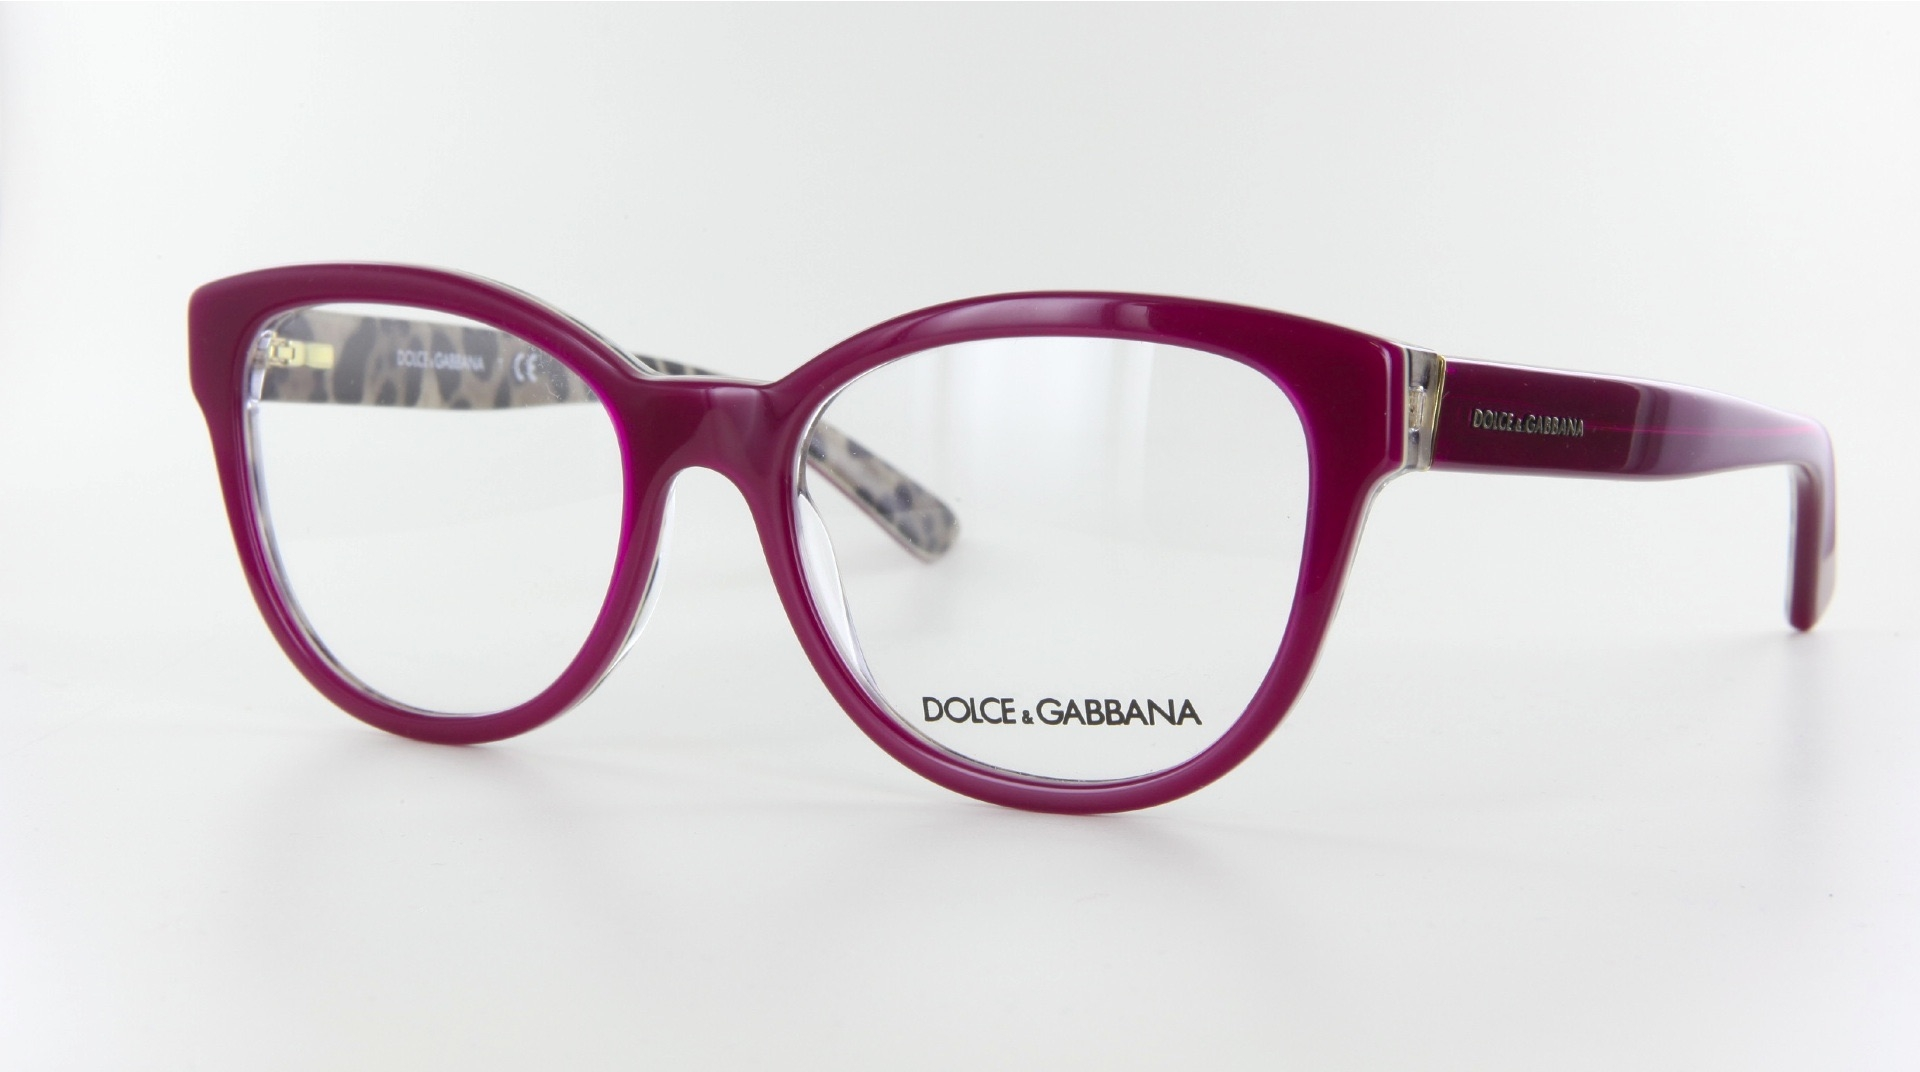 Dolce & Gabbana - ref: 72005